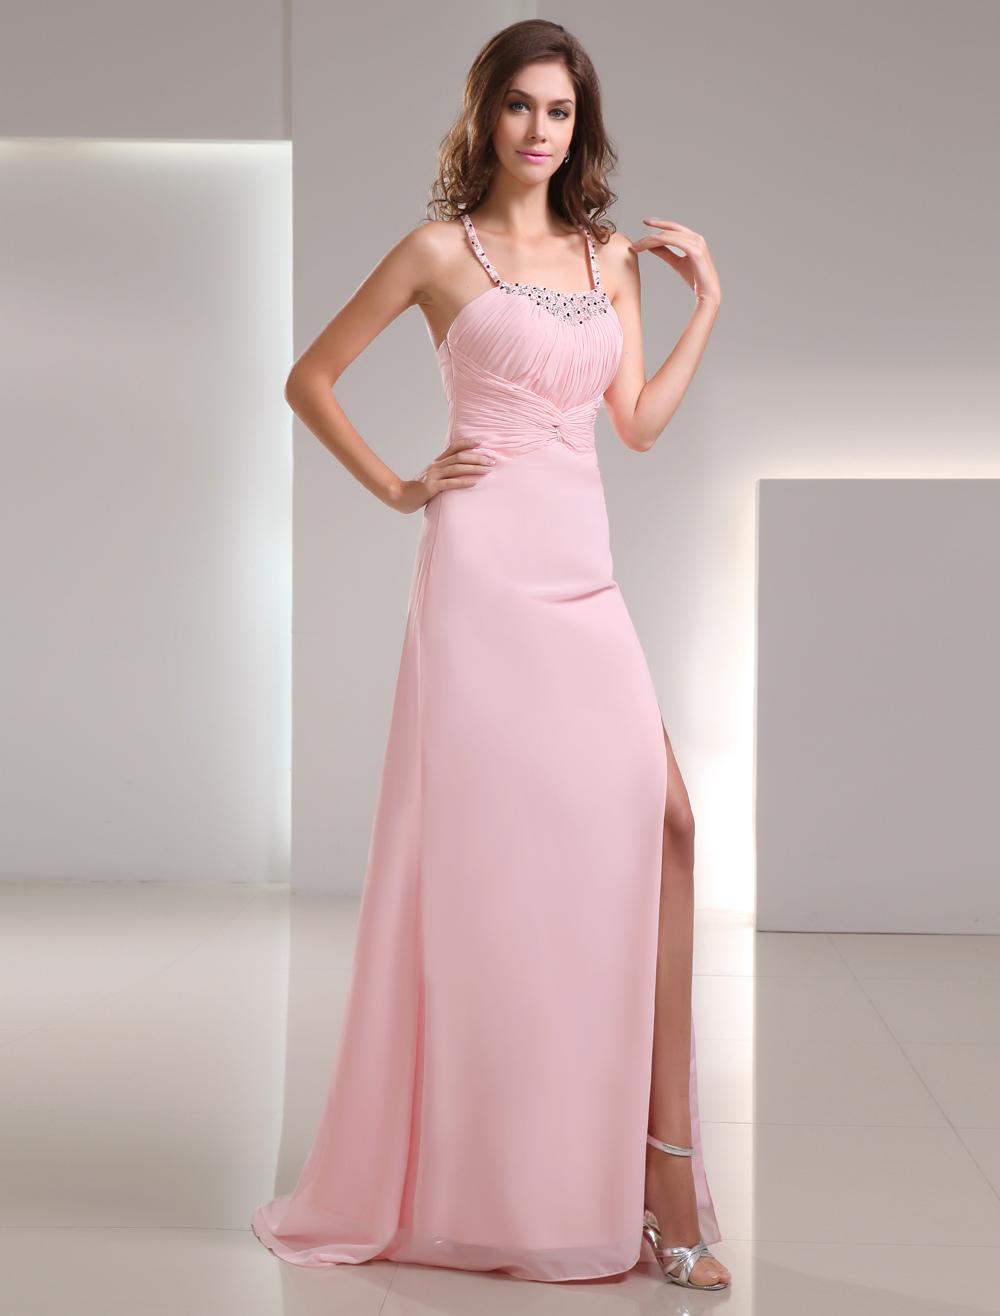 Sheath Pink Chiffon Ruched Sweep Prom Dress (Wedding Prom Dresses) photo